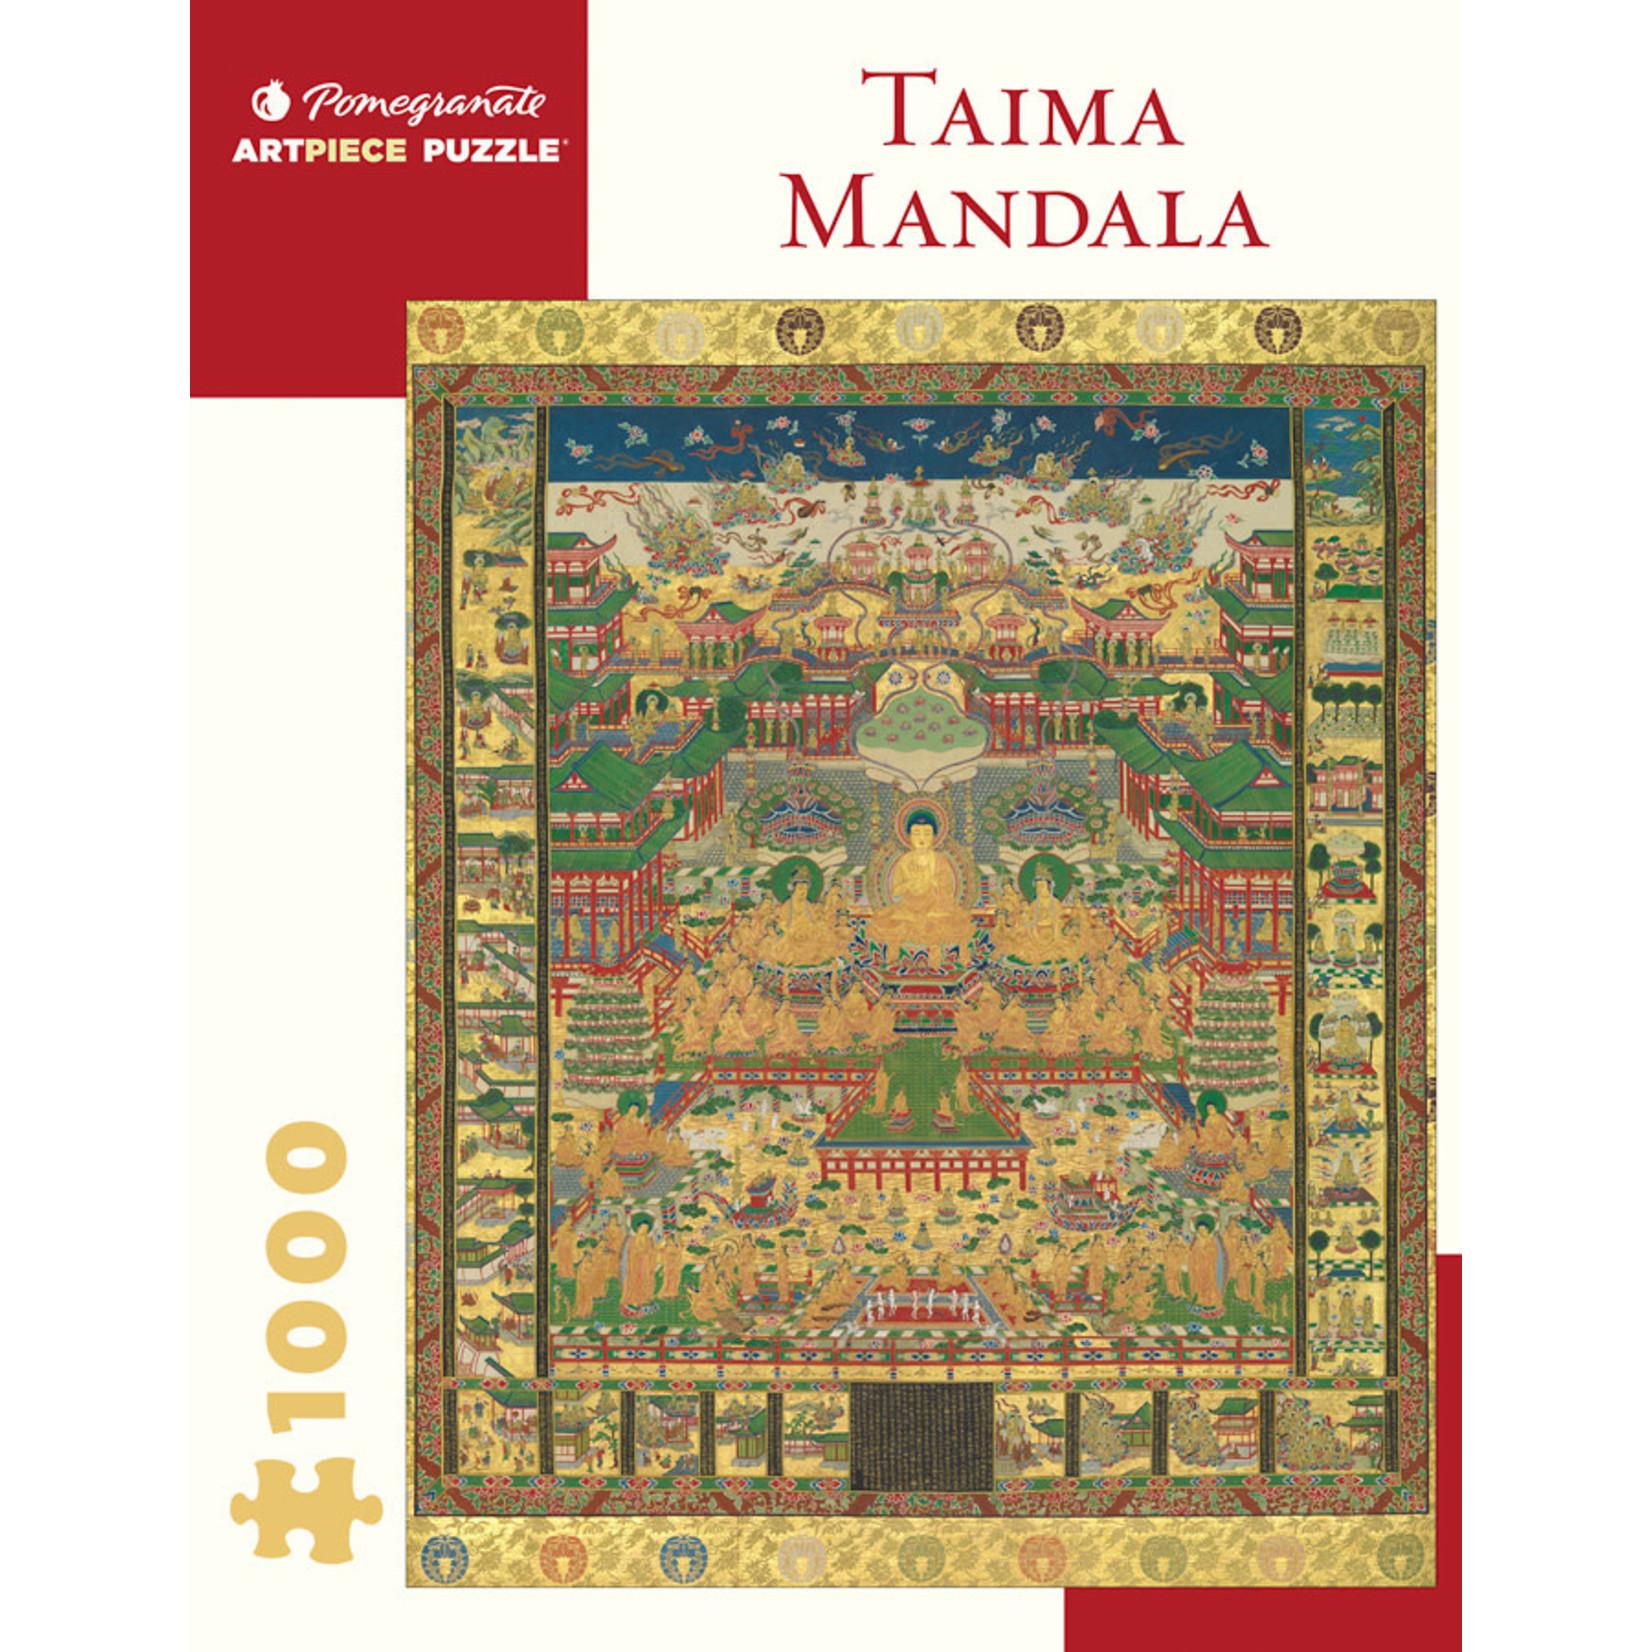 Pomegranate Puzzles Taima Mandala 1000pc